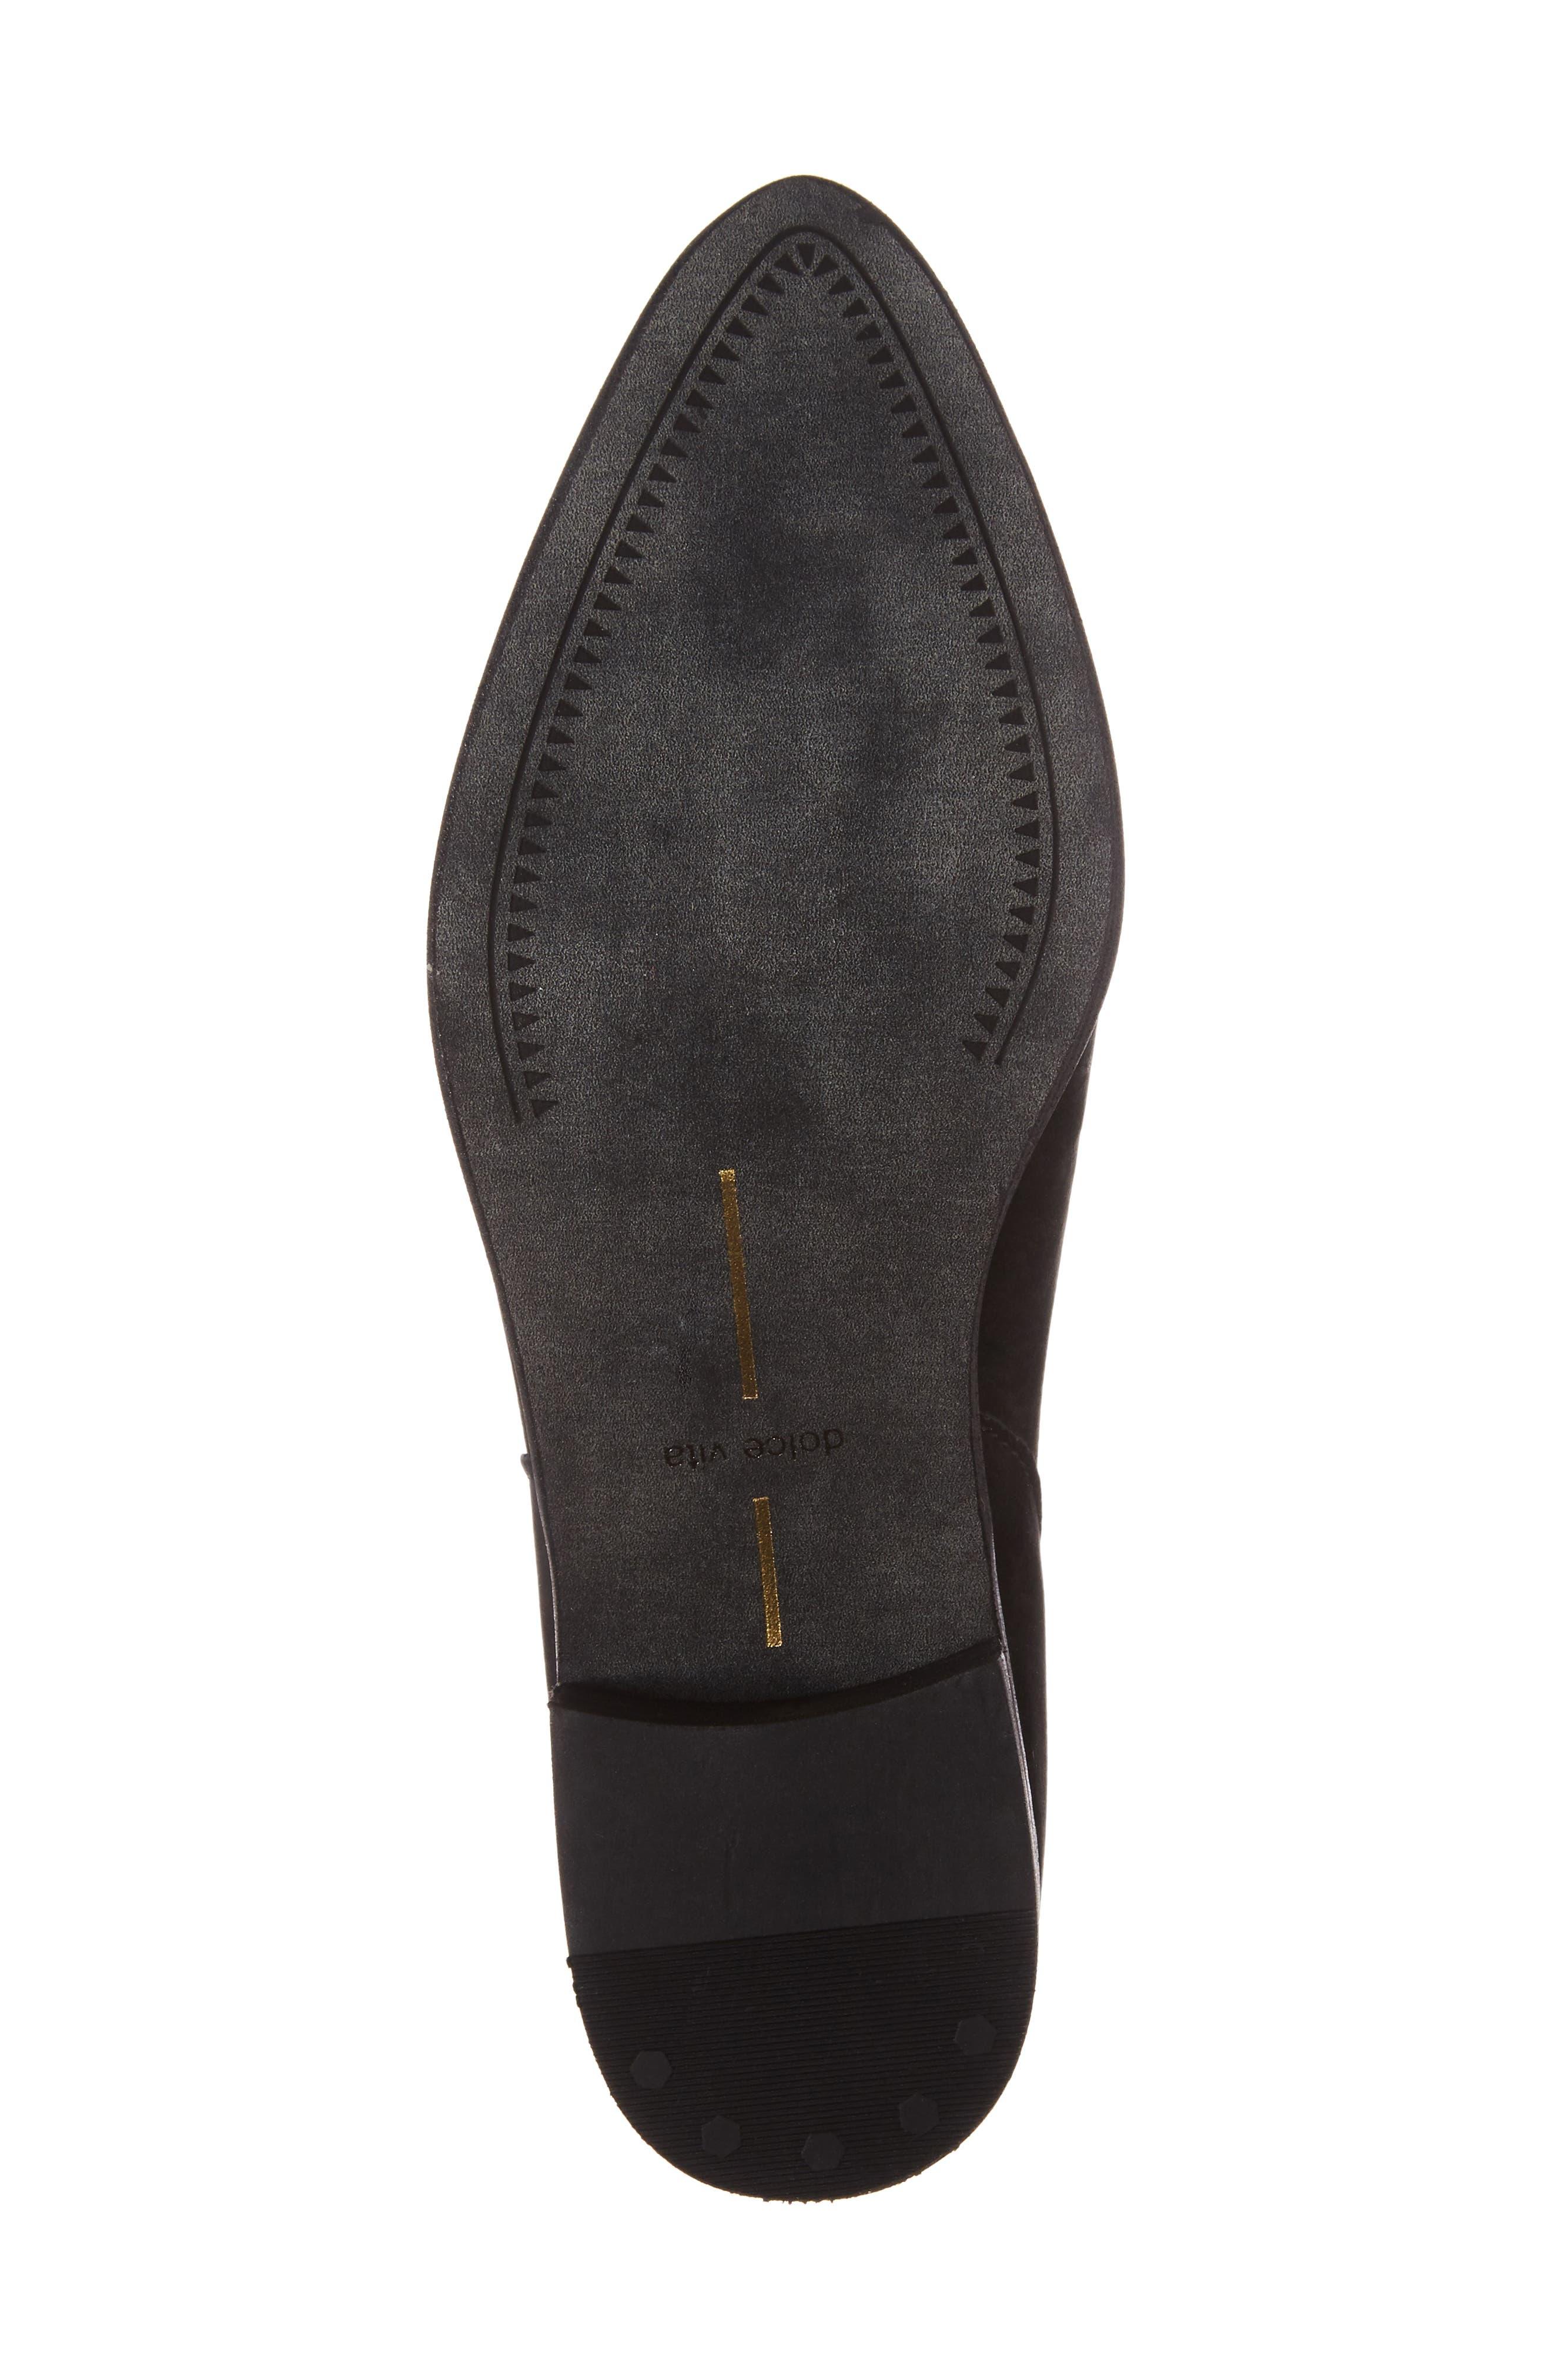 Cassius Block Heel Bootie,                             Alternate thumbnail 6, color,                             Black Nubuck Leather